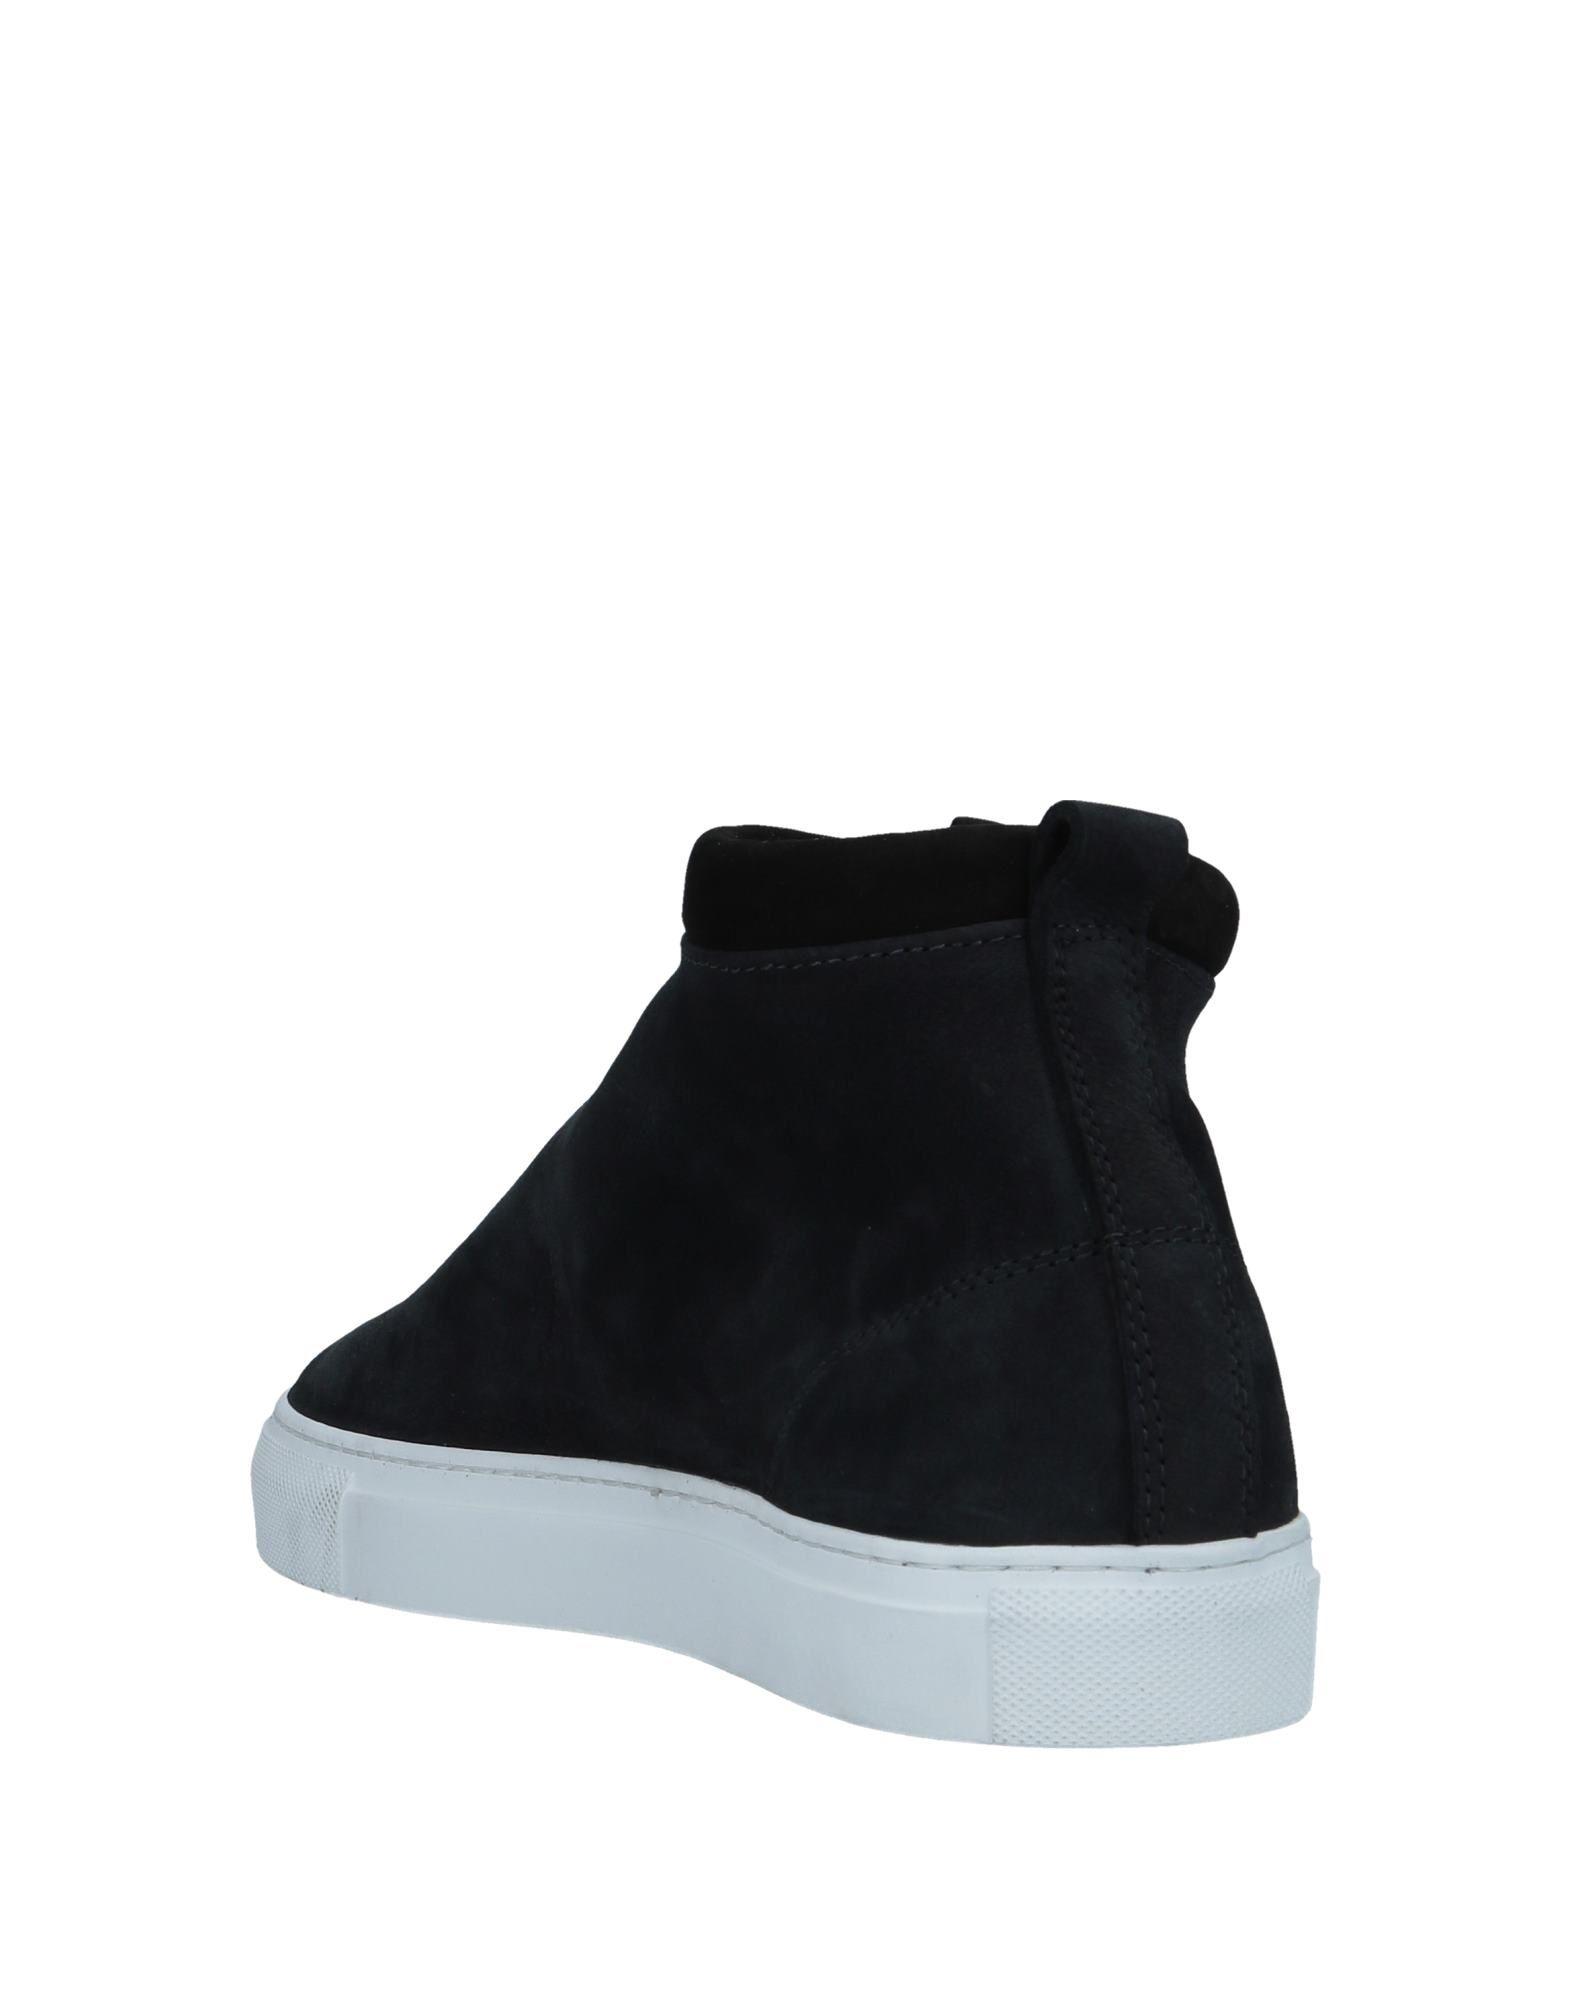 Diemme Sneakers Herren  beliebte 11500569BO Gute Qualität beliebte  Schuhe bb1be9